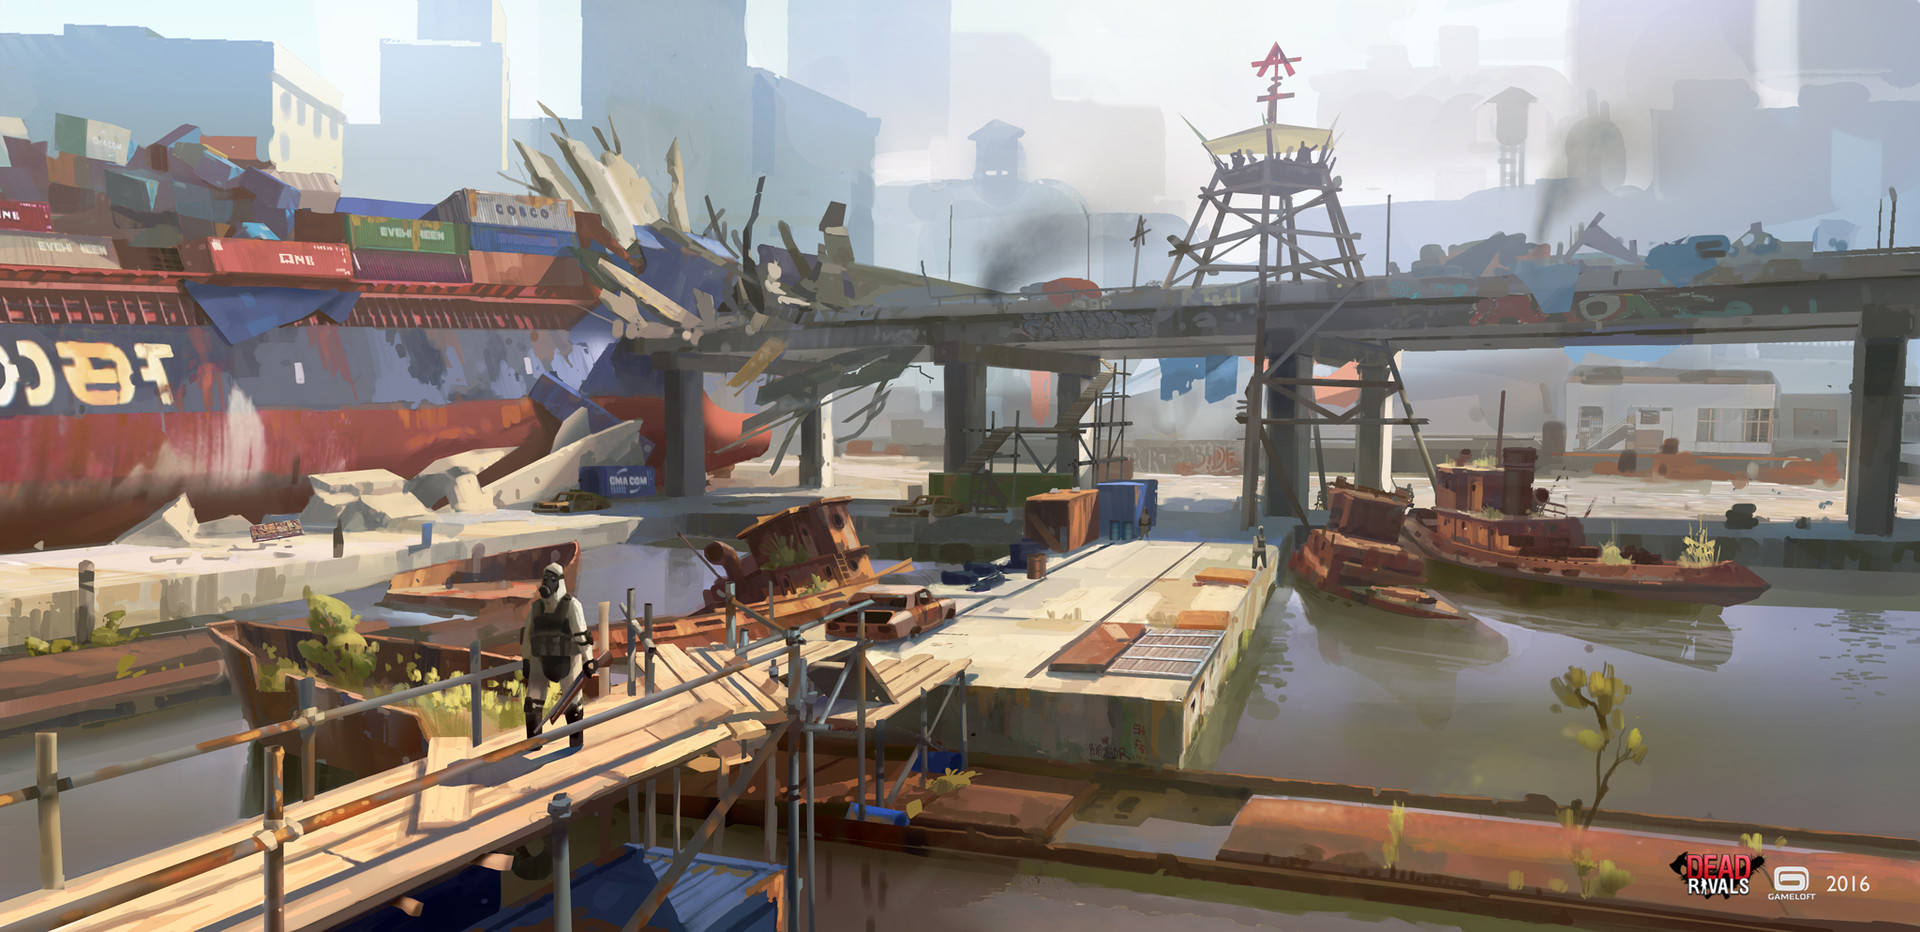 Adrien girod dw env ship graveyard 05c artstation